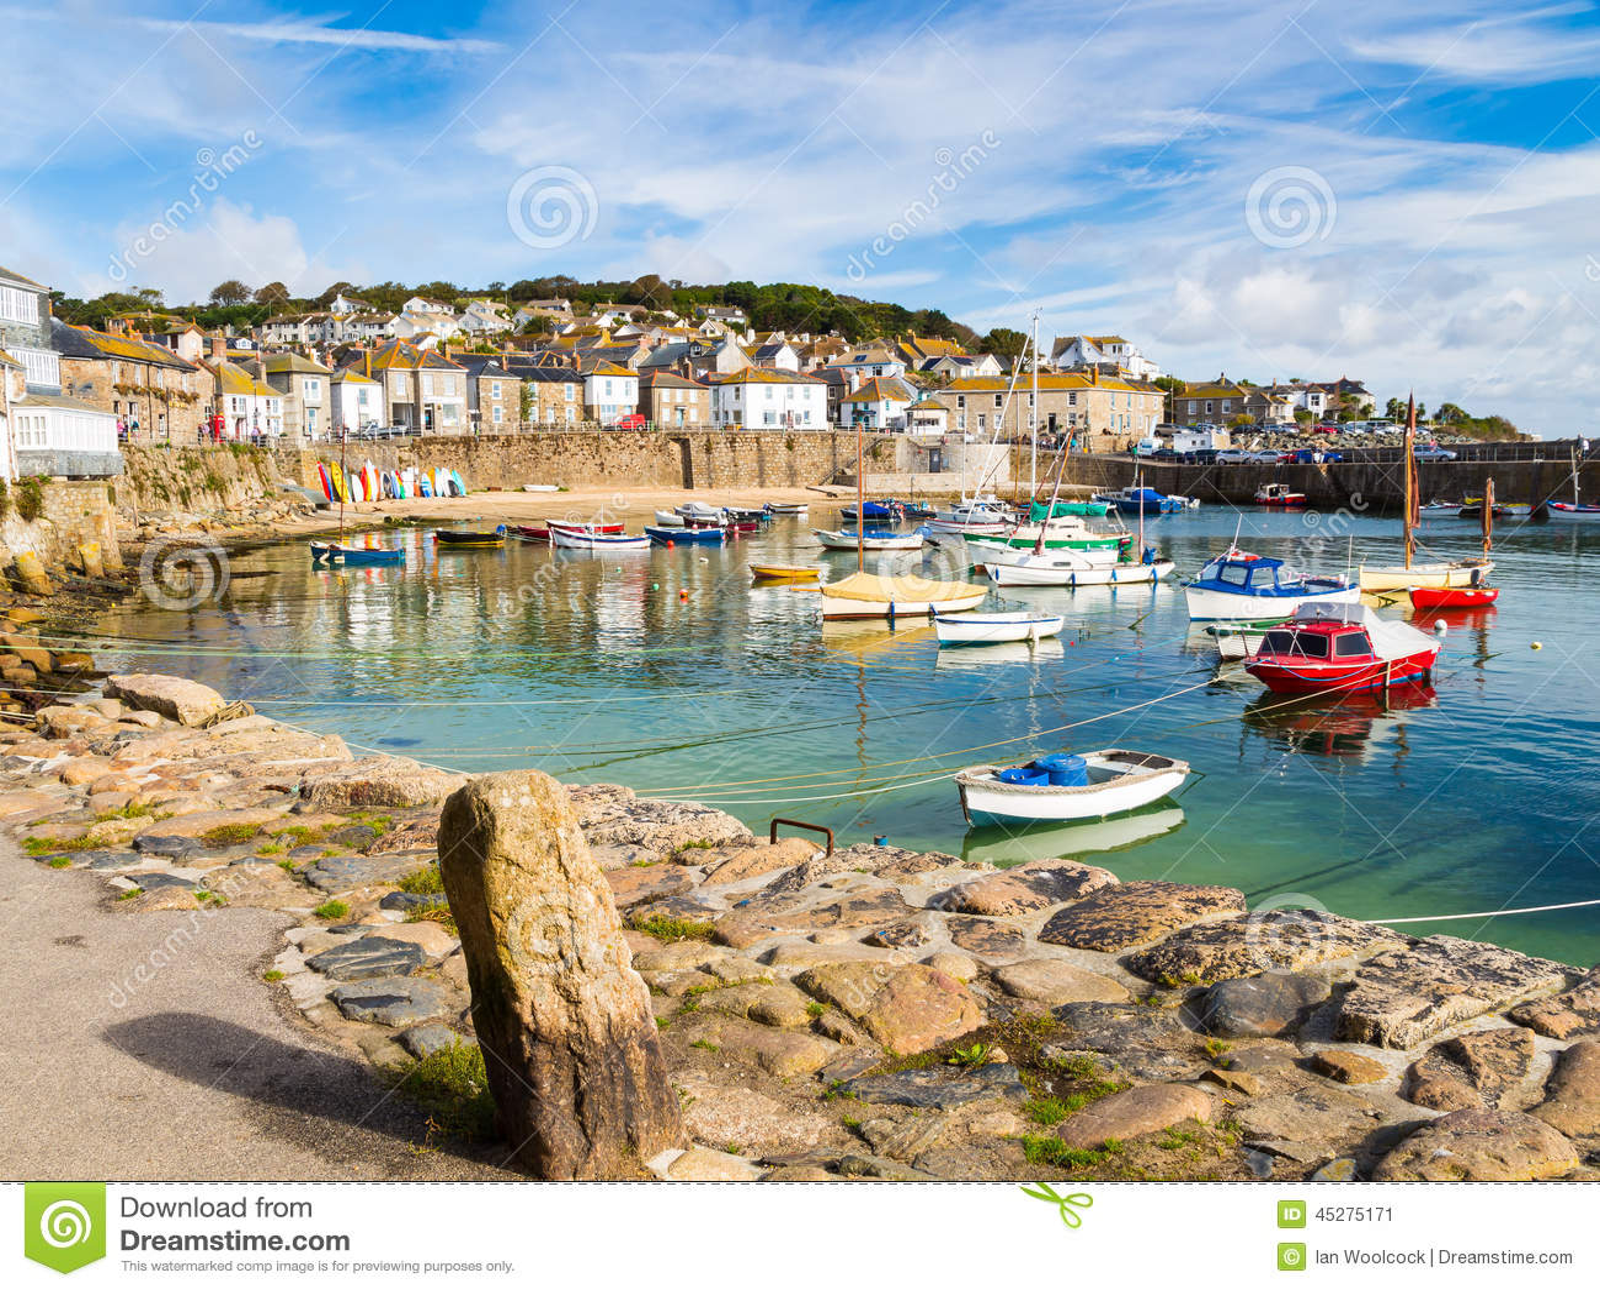 Mousehole Cornwall England Stock Photo - Image: 45275171